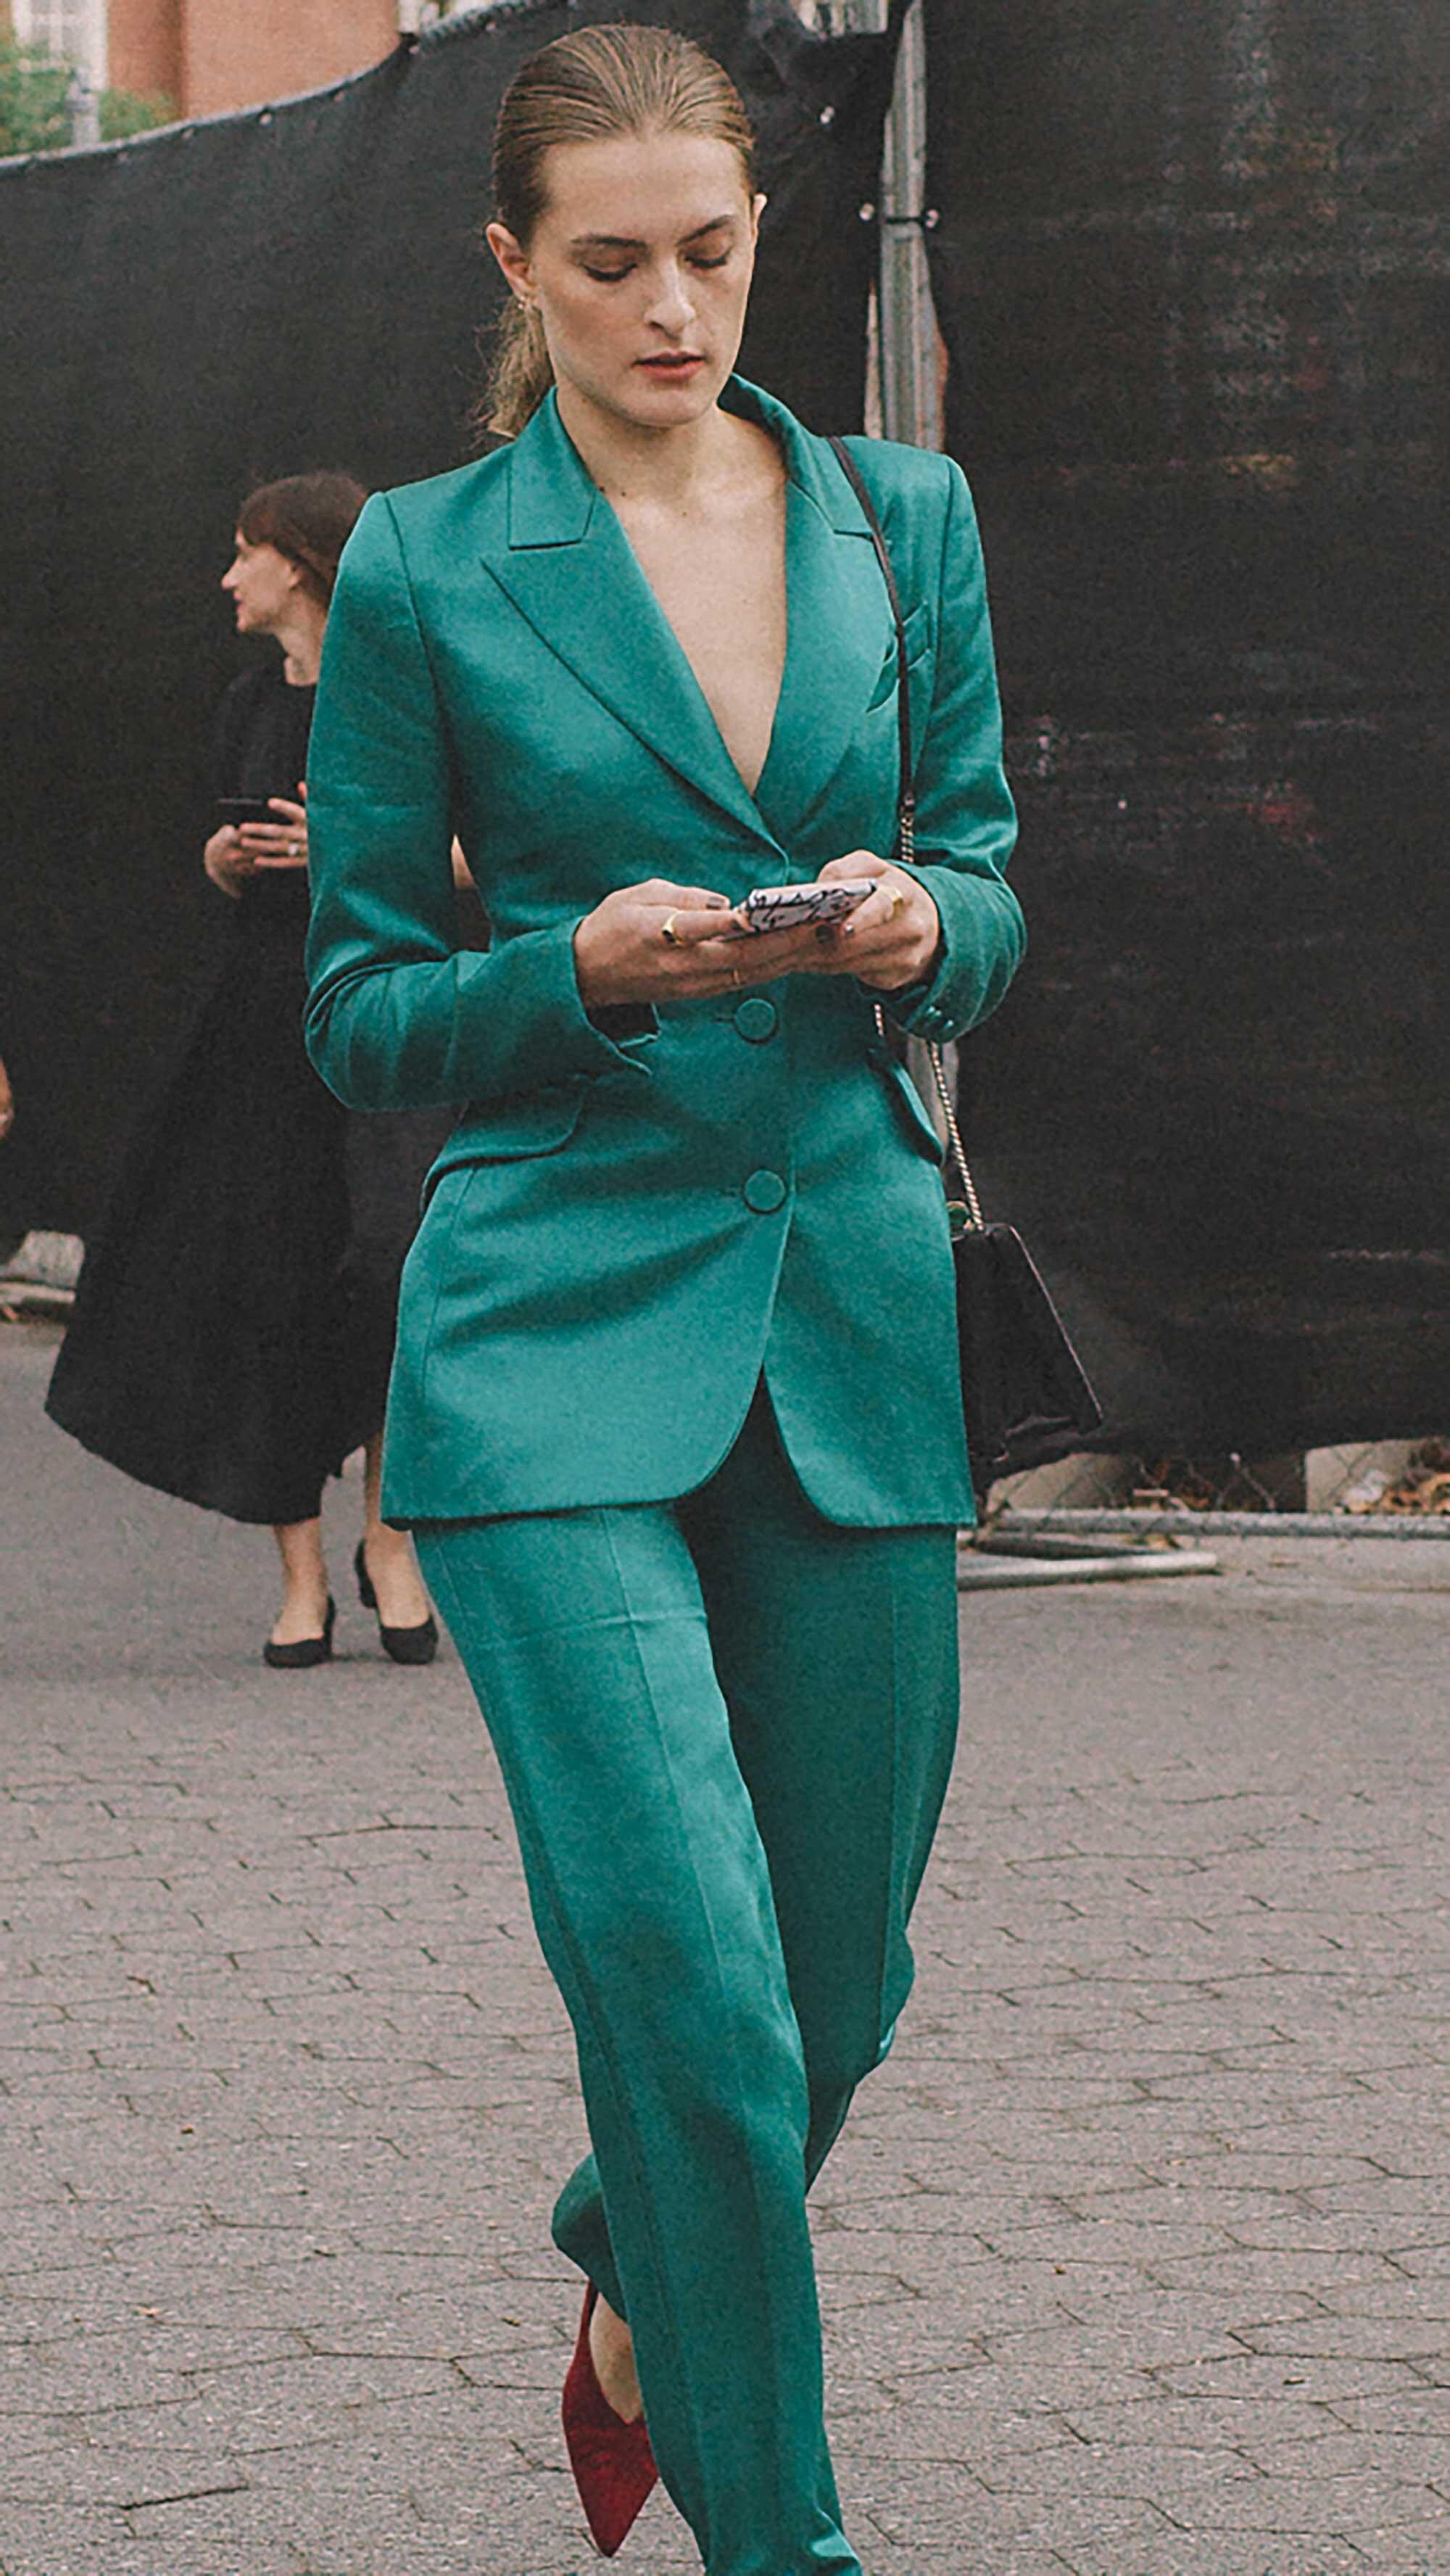 Click for more looks! Best outfits of New York Fashion Week street style 2019 Day Three Photo by @J2martinez Jose J. Martinez www.jmrtnz.com -12.jpg